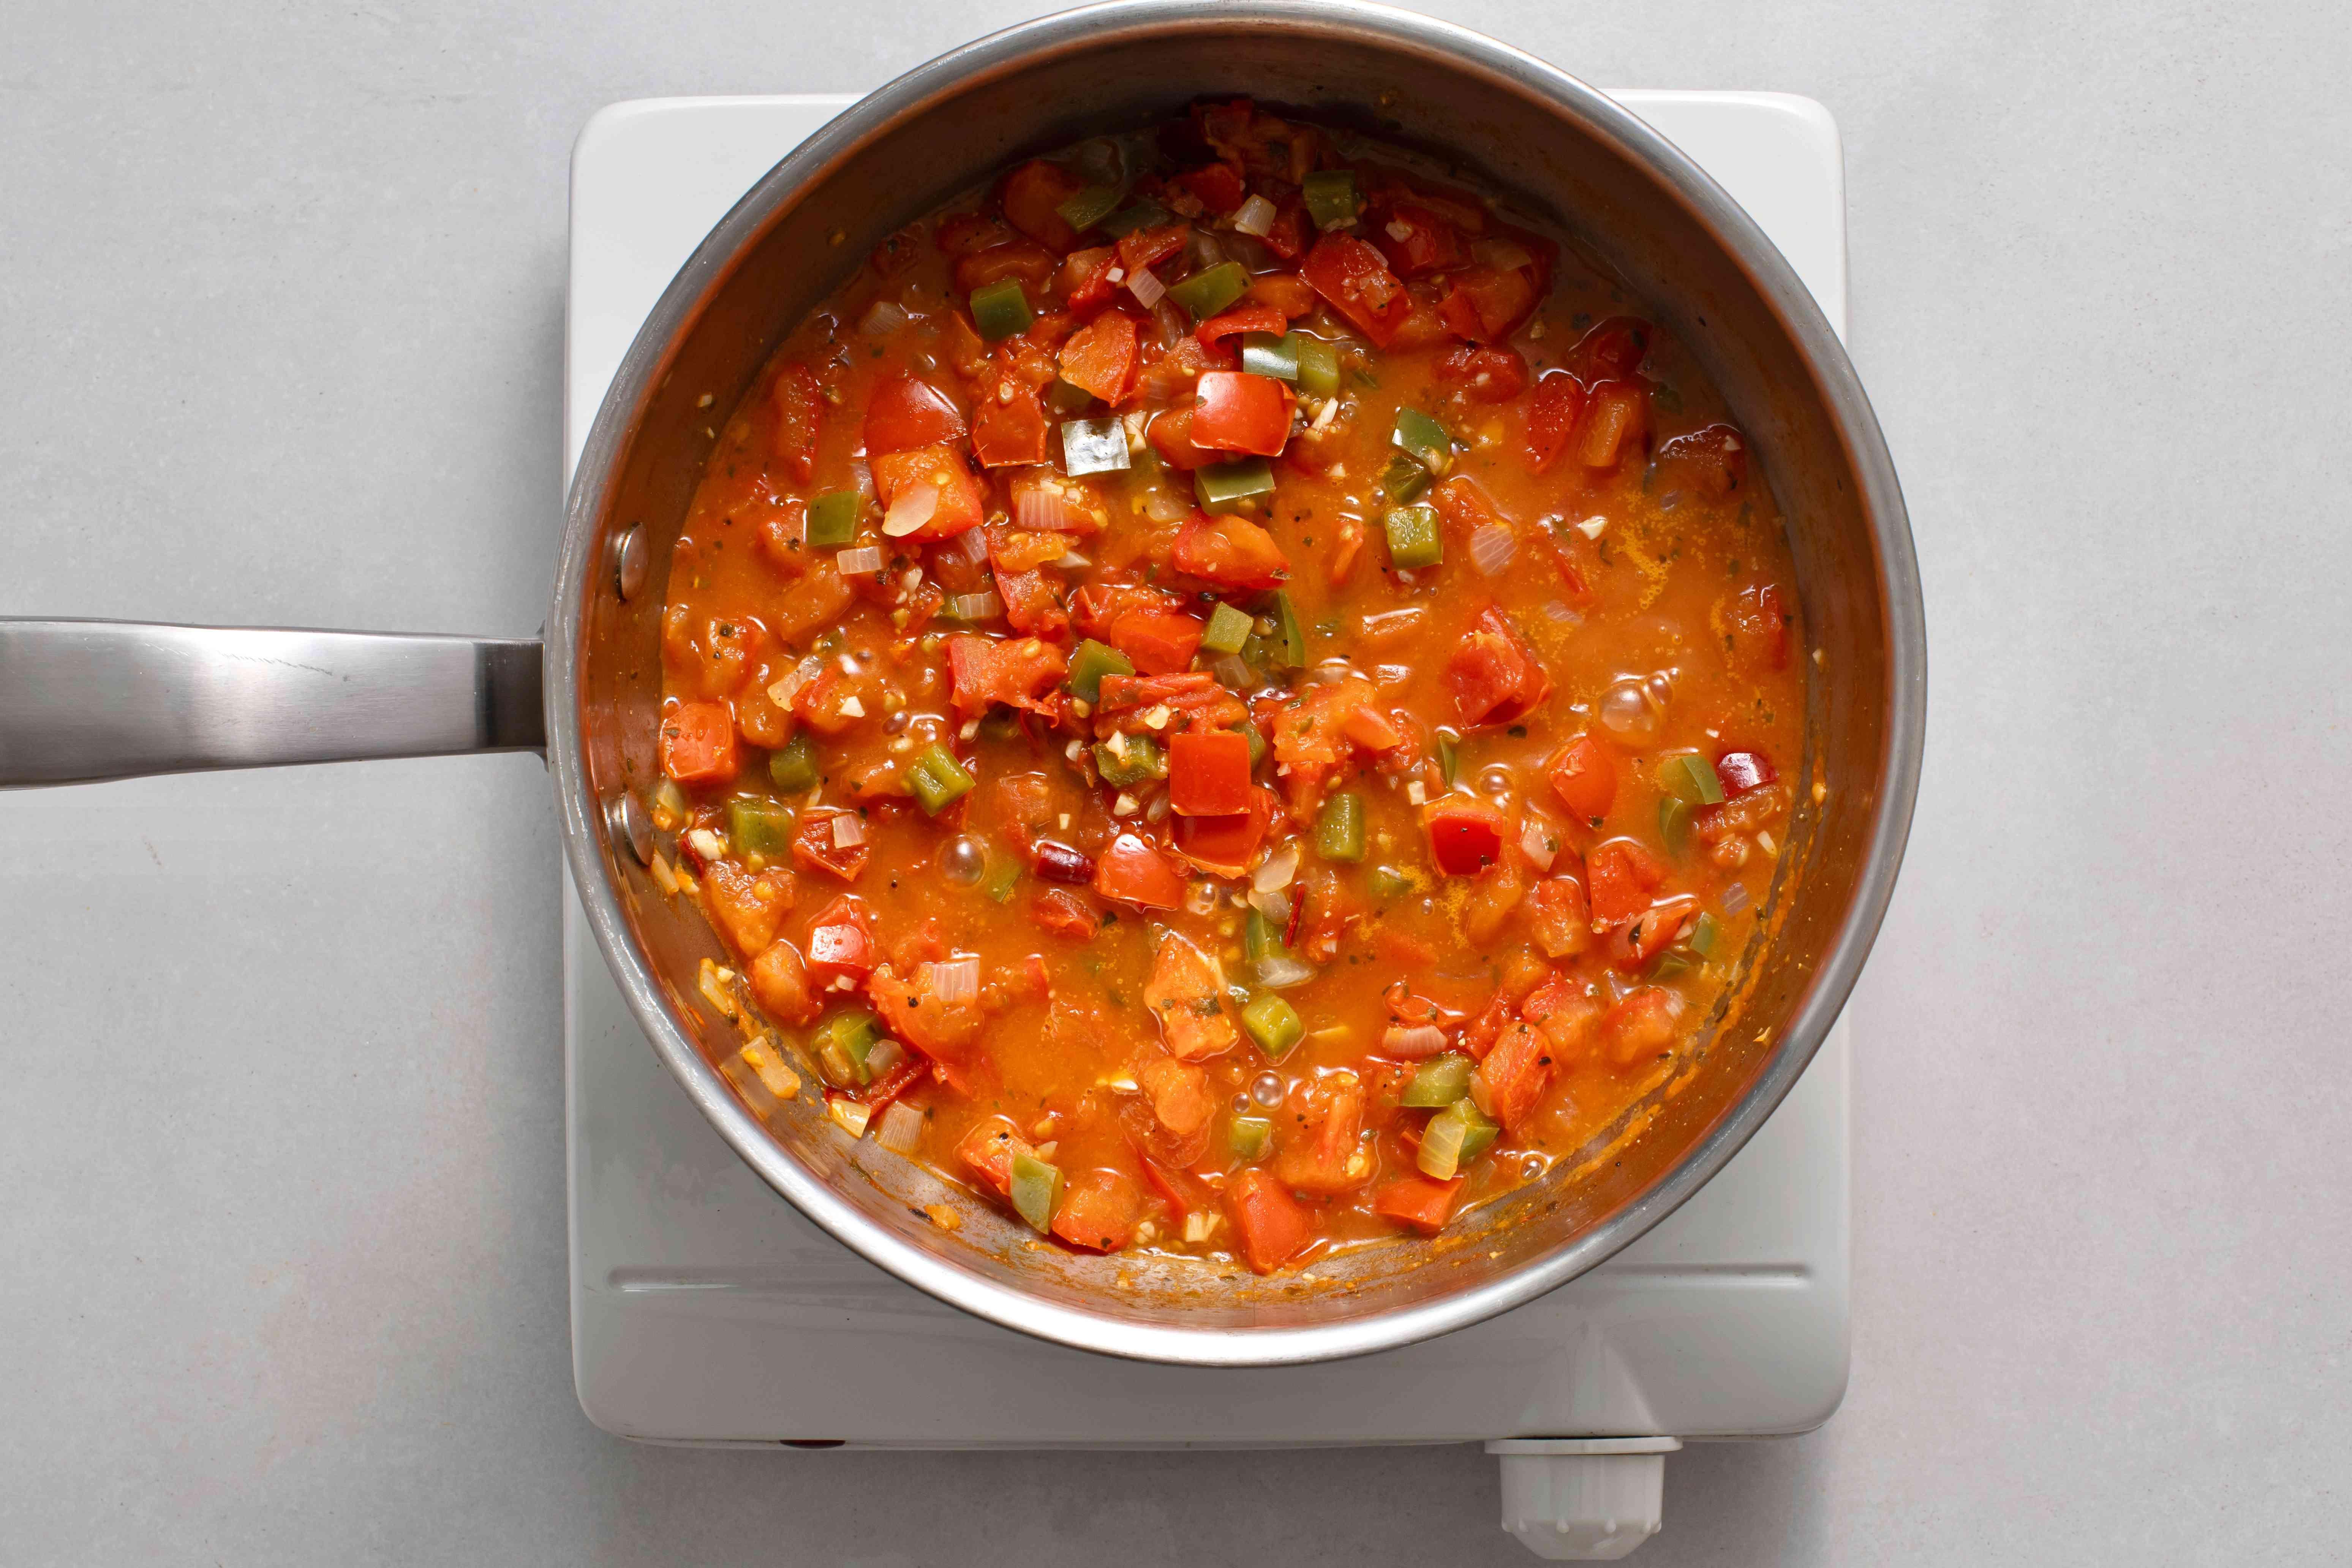 sauce in a saucepan